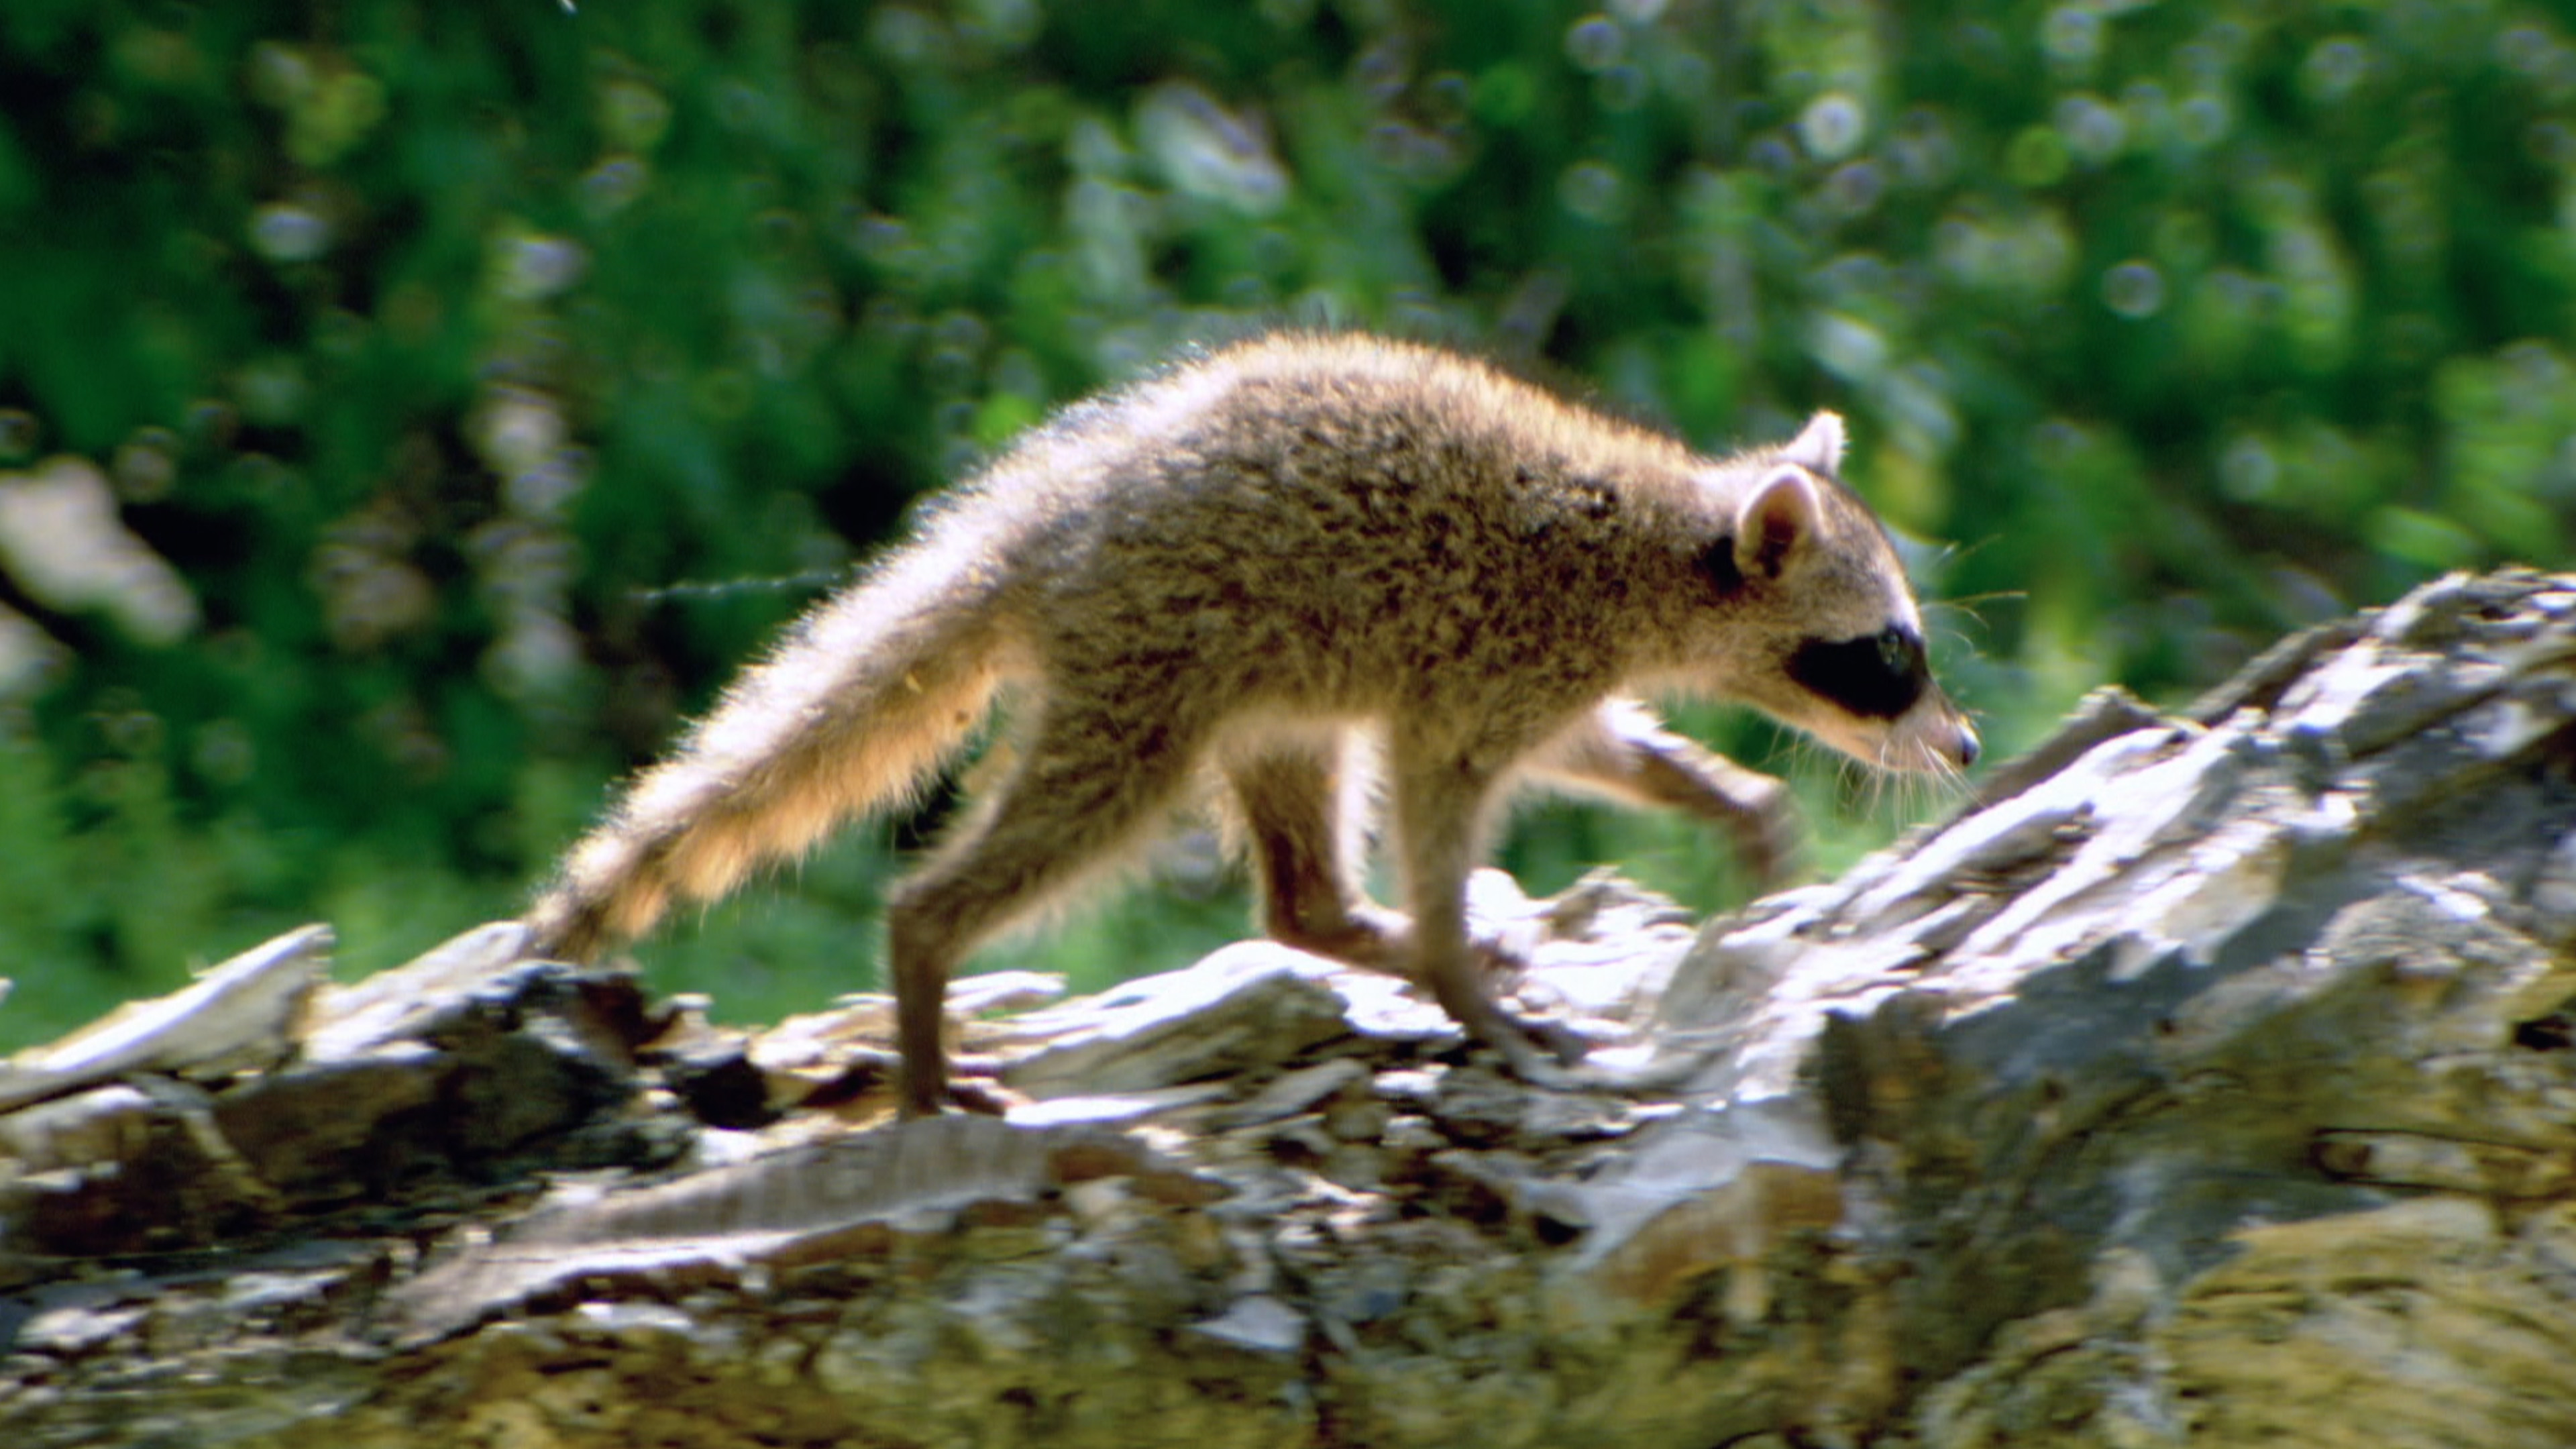 Raccoon (Procyan cancrivorus)